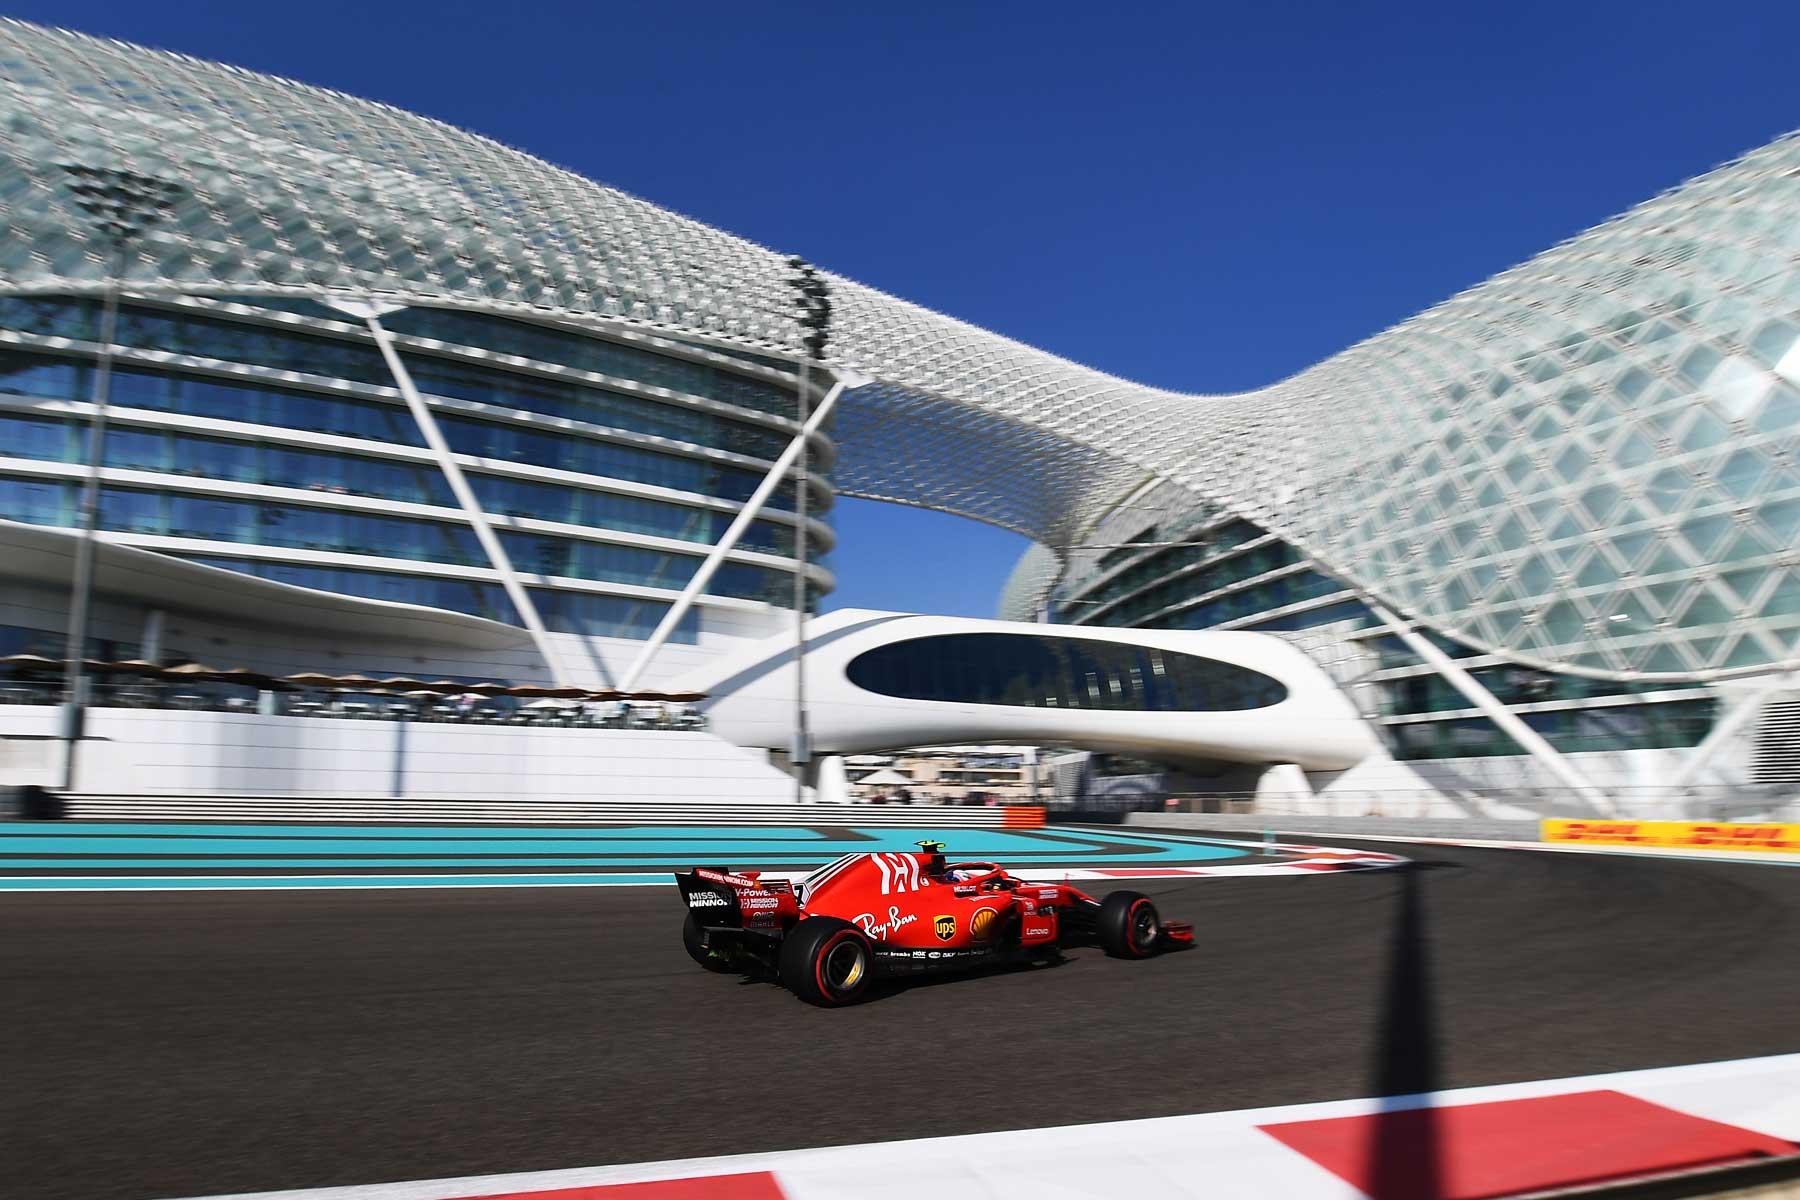 Abu Dhabis Grand Prix